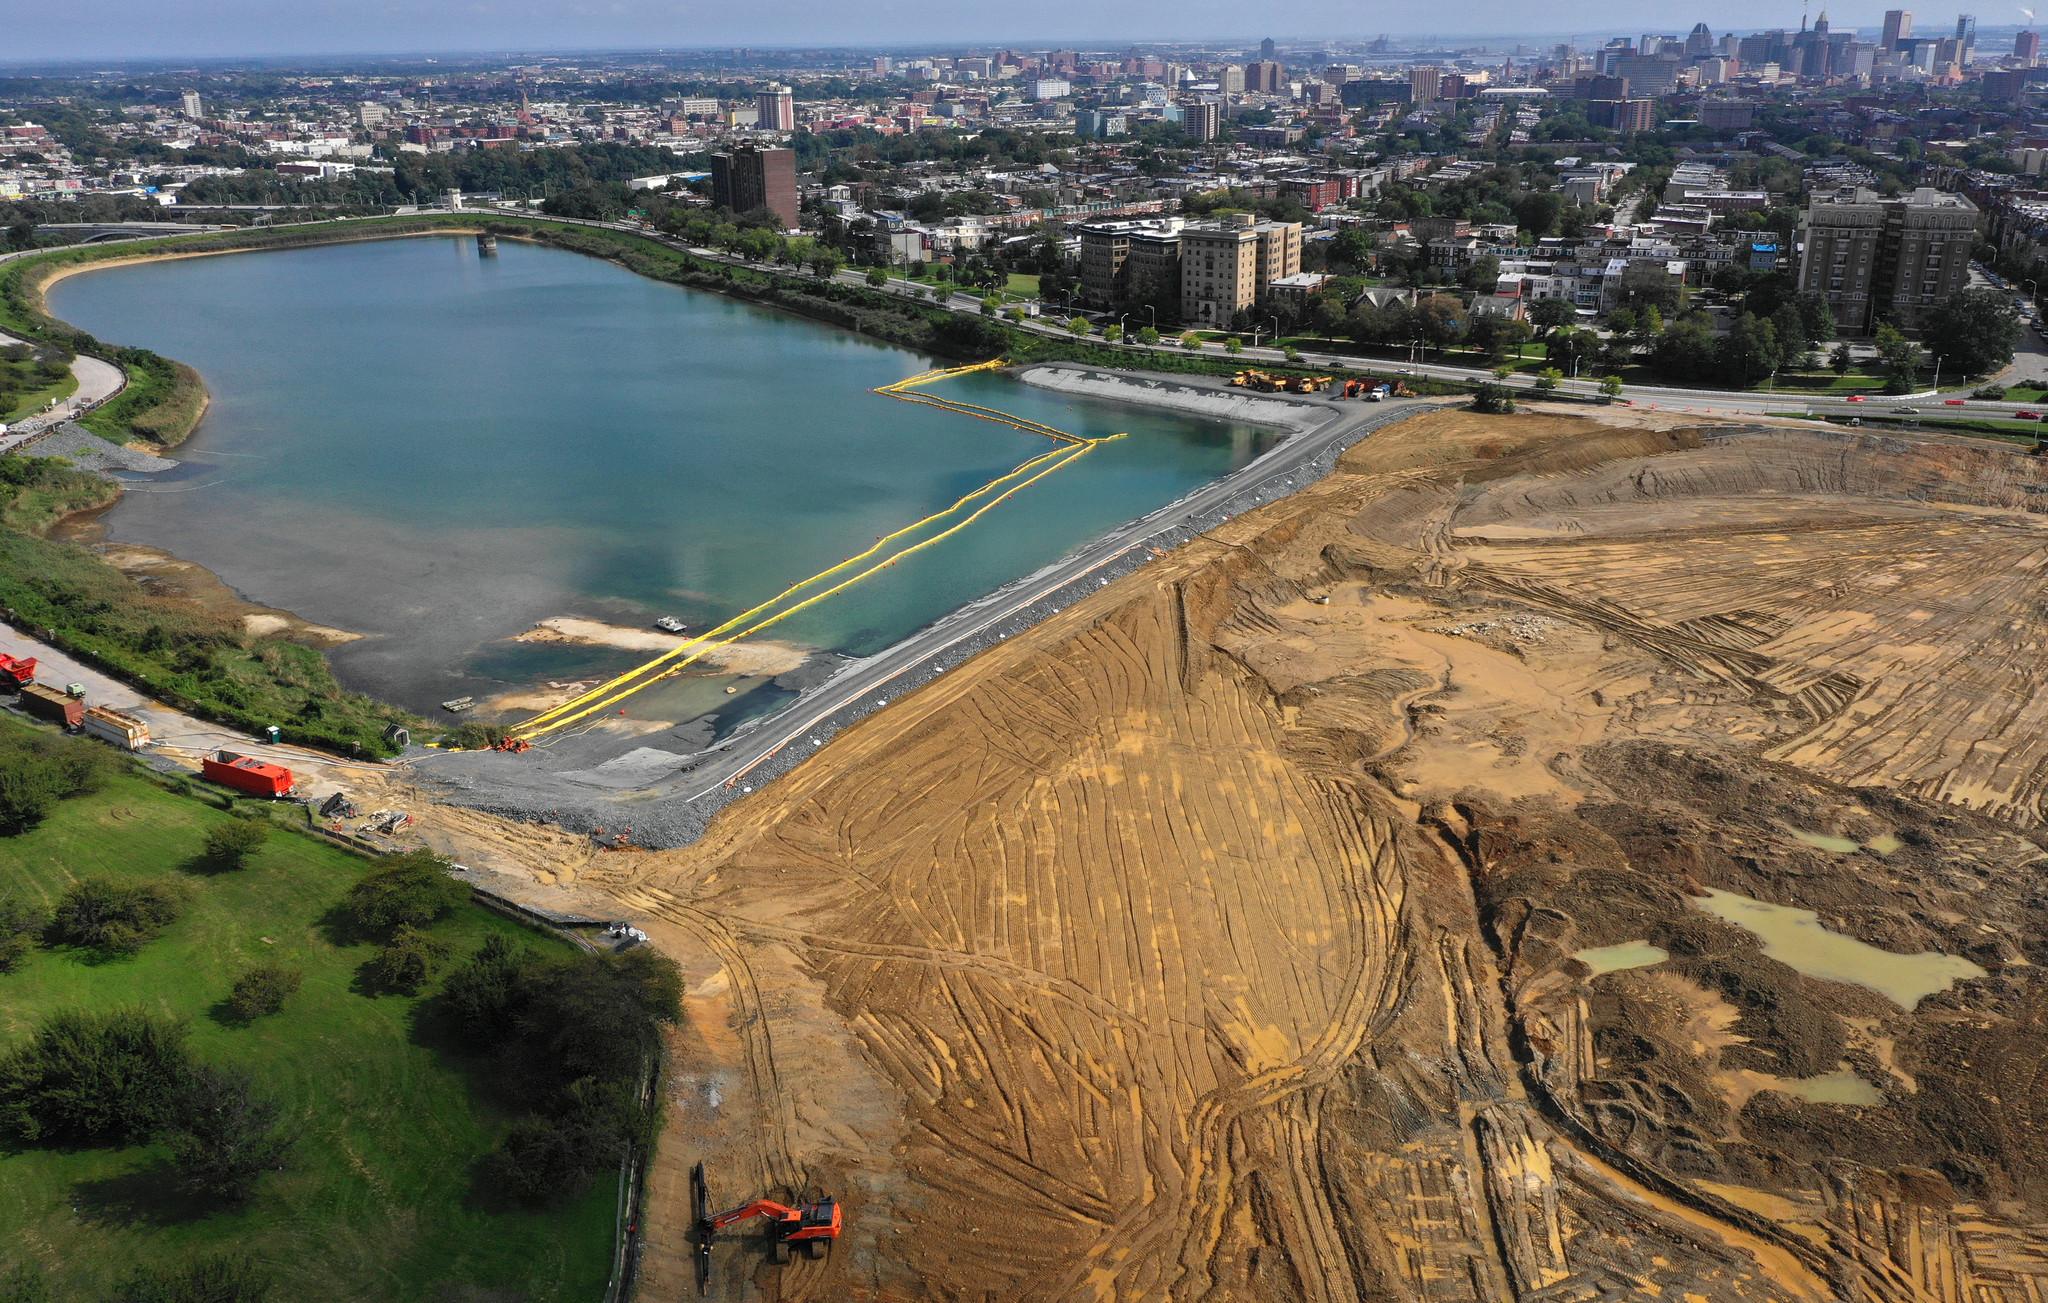 Remaking Baltimore's Druid Lake: $140 million water project